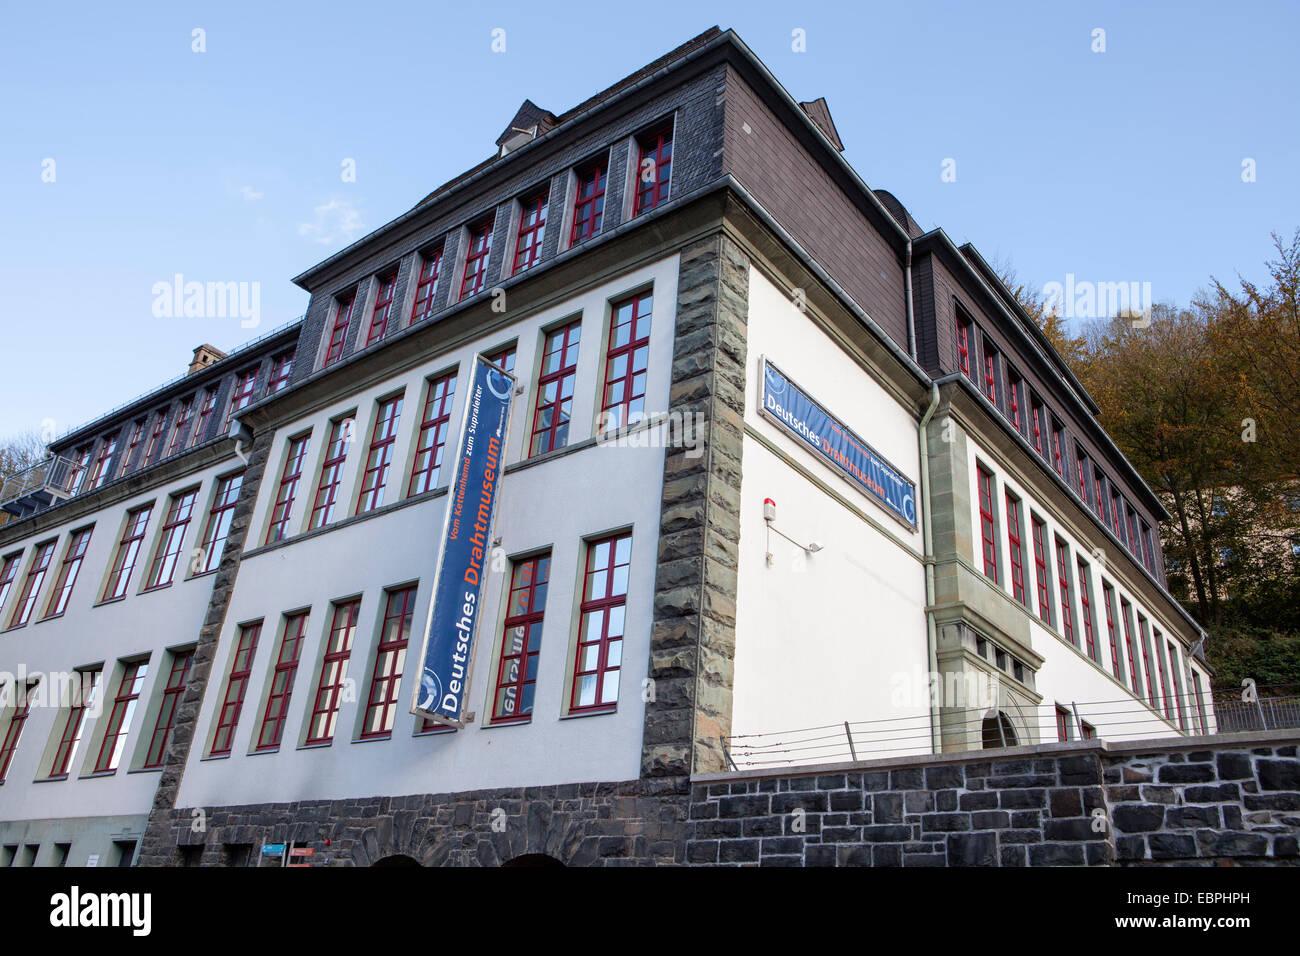 Il filo tedesco Museo, Altena, Lennetal, Maerkischer Kreis, Sauerland, Renania settentrionale-Vestfalia, Germania, Immagini Stock